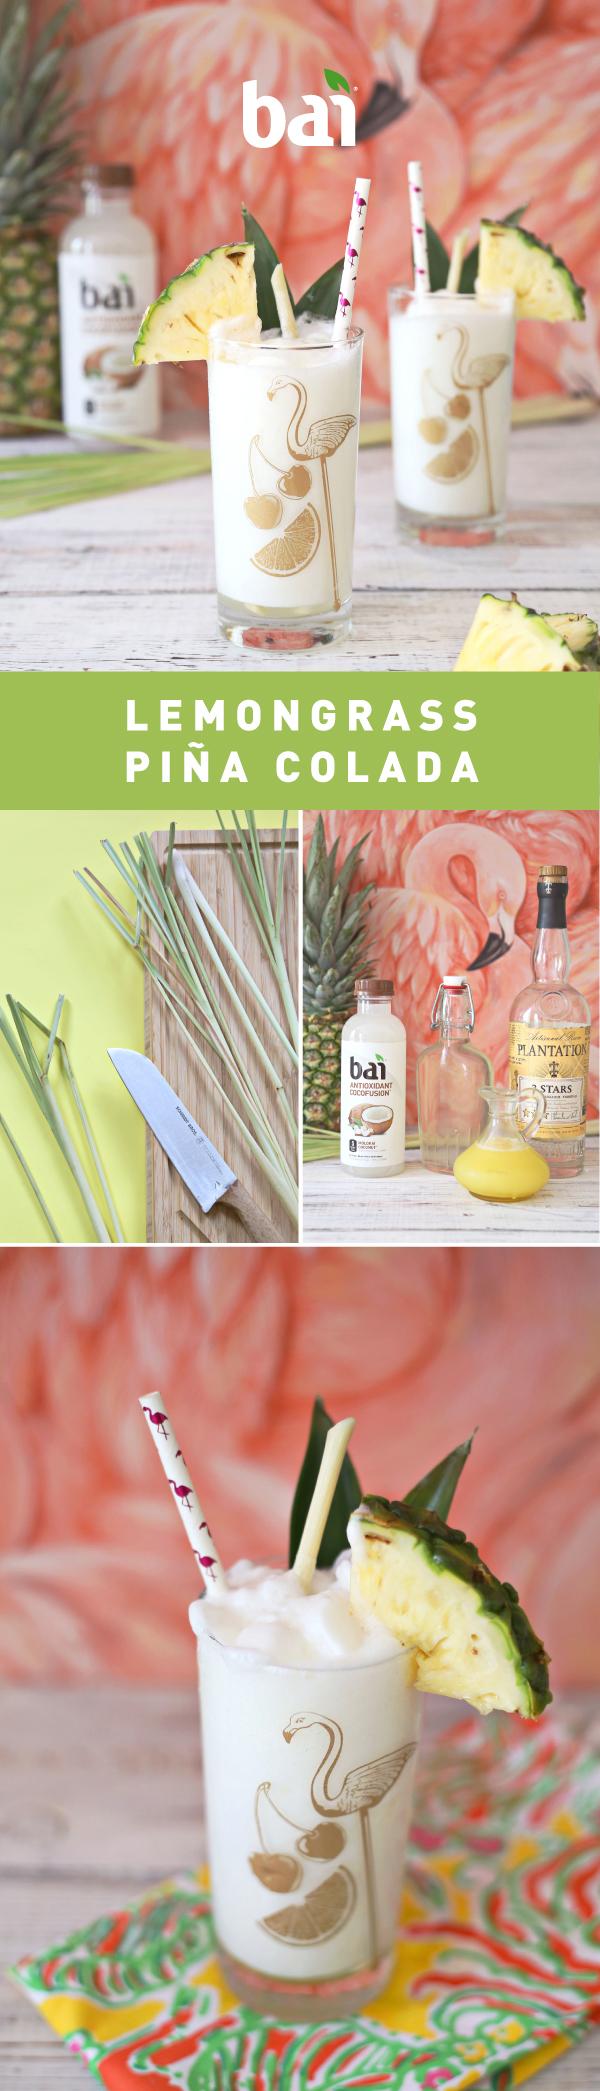 Lemongrass Pina Colada Bai Flavor Life Refreshing Drinks Fun Drinks Pina Colada Recipe